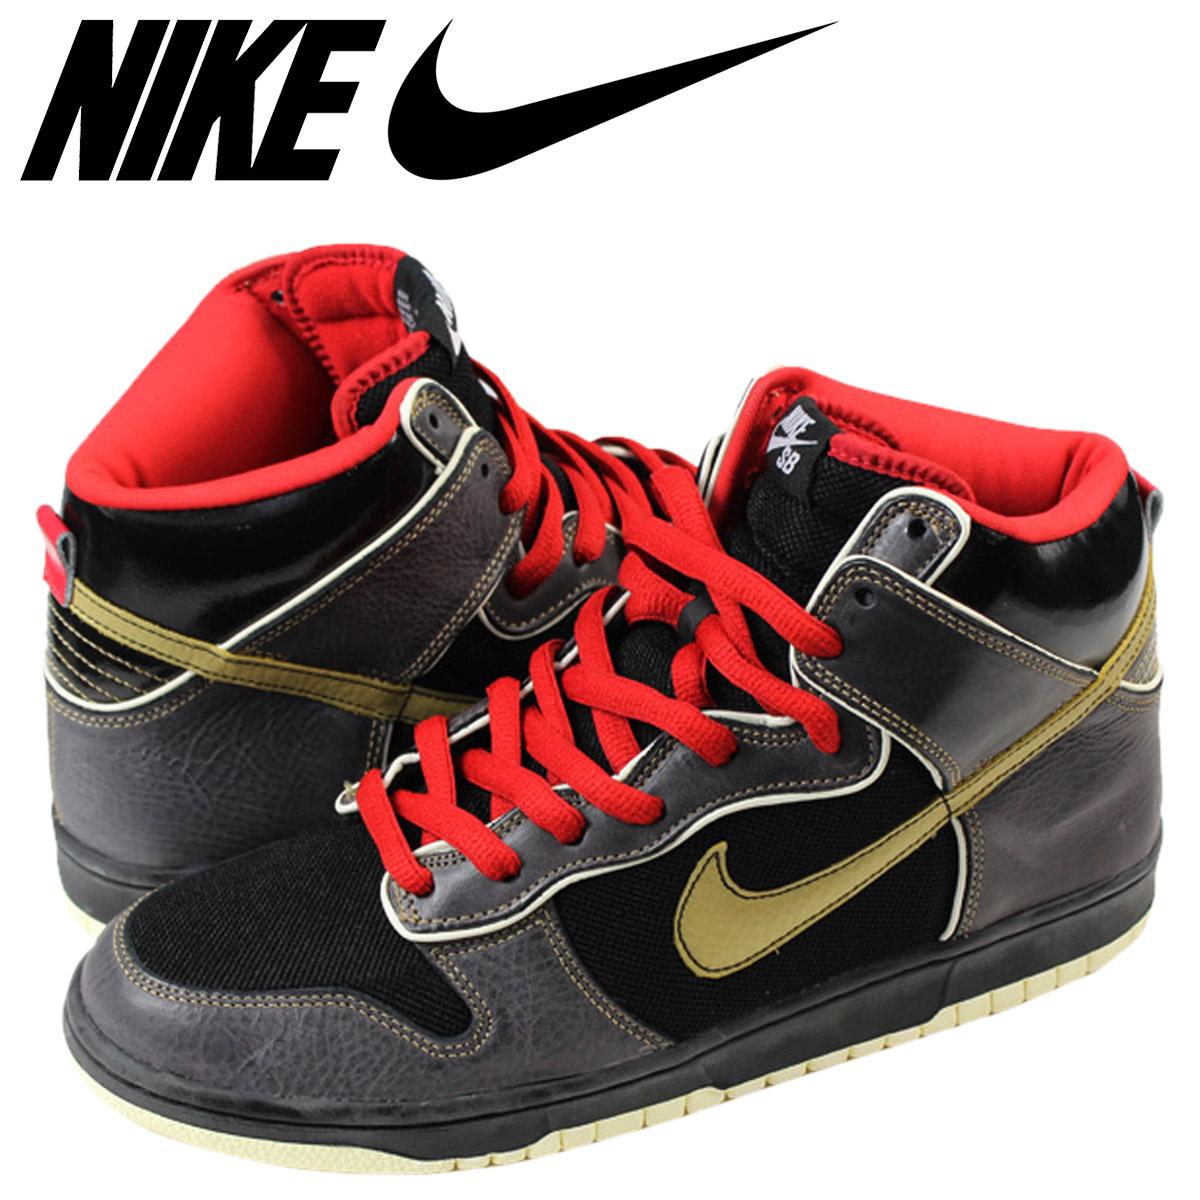 07f187c2428e Nike NIKE dunk sneakers DUNK HI SB MARSHALL AMP dunk Hi SB Marshall amps  313171-071 black mens